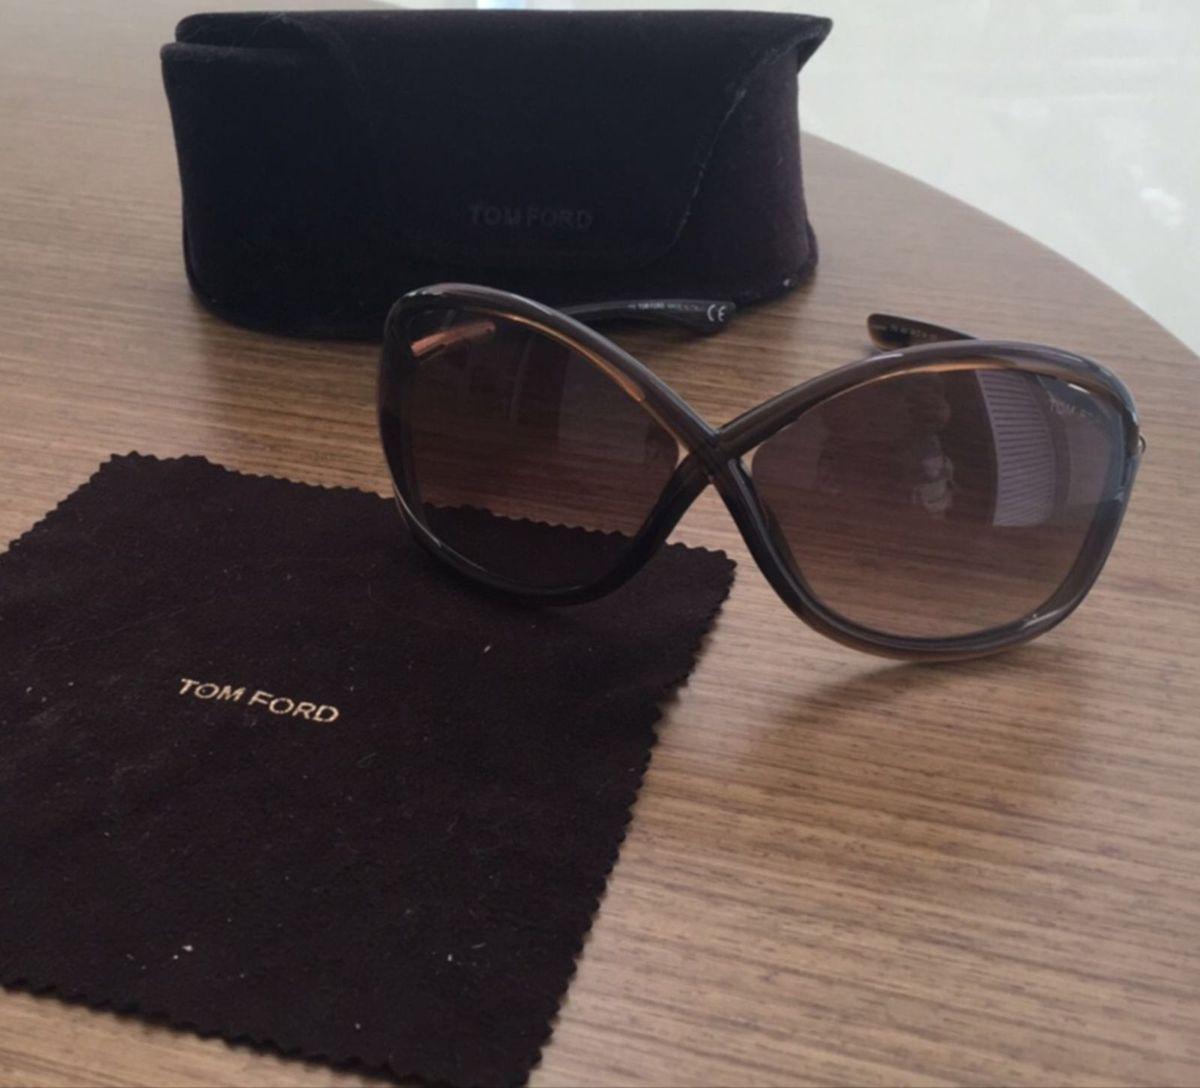 0caa923134f6f Óculos Tom Ford Modelo Whitney Marrom   Óculos Feminino Tom Ford ...